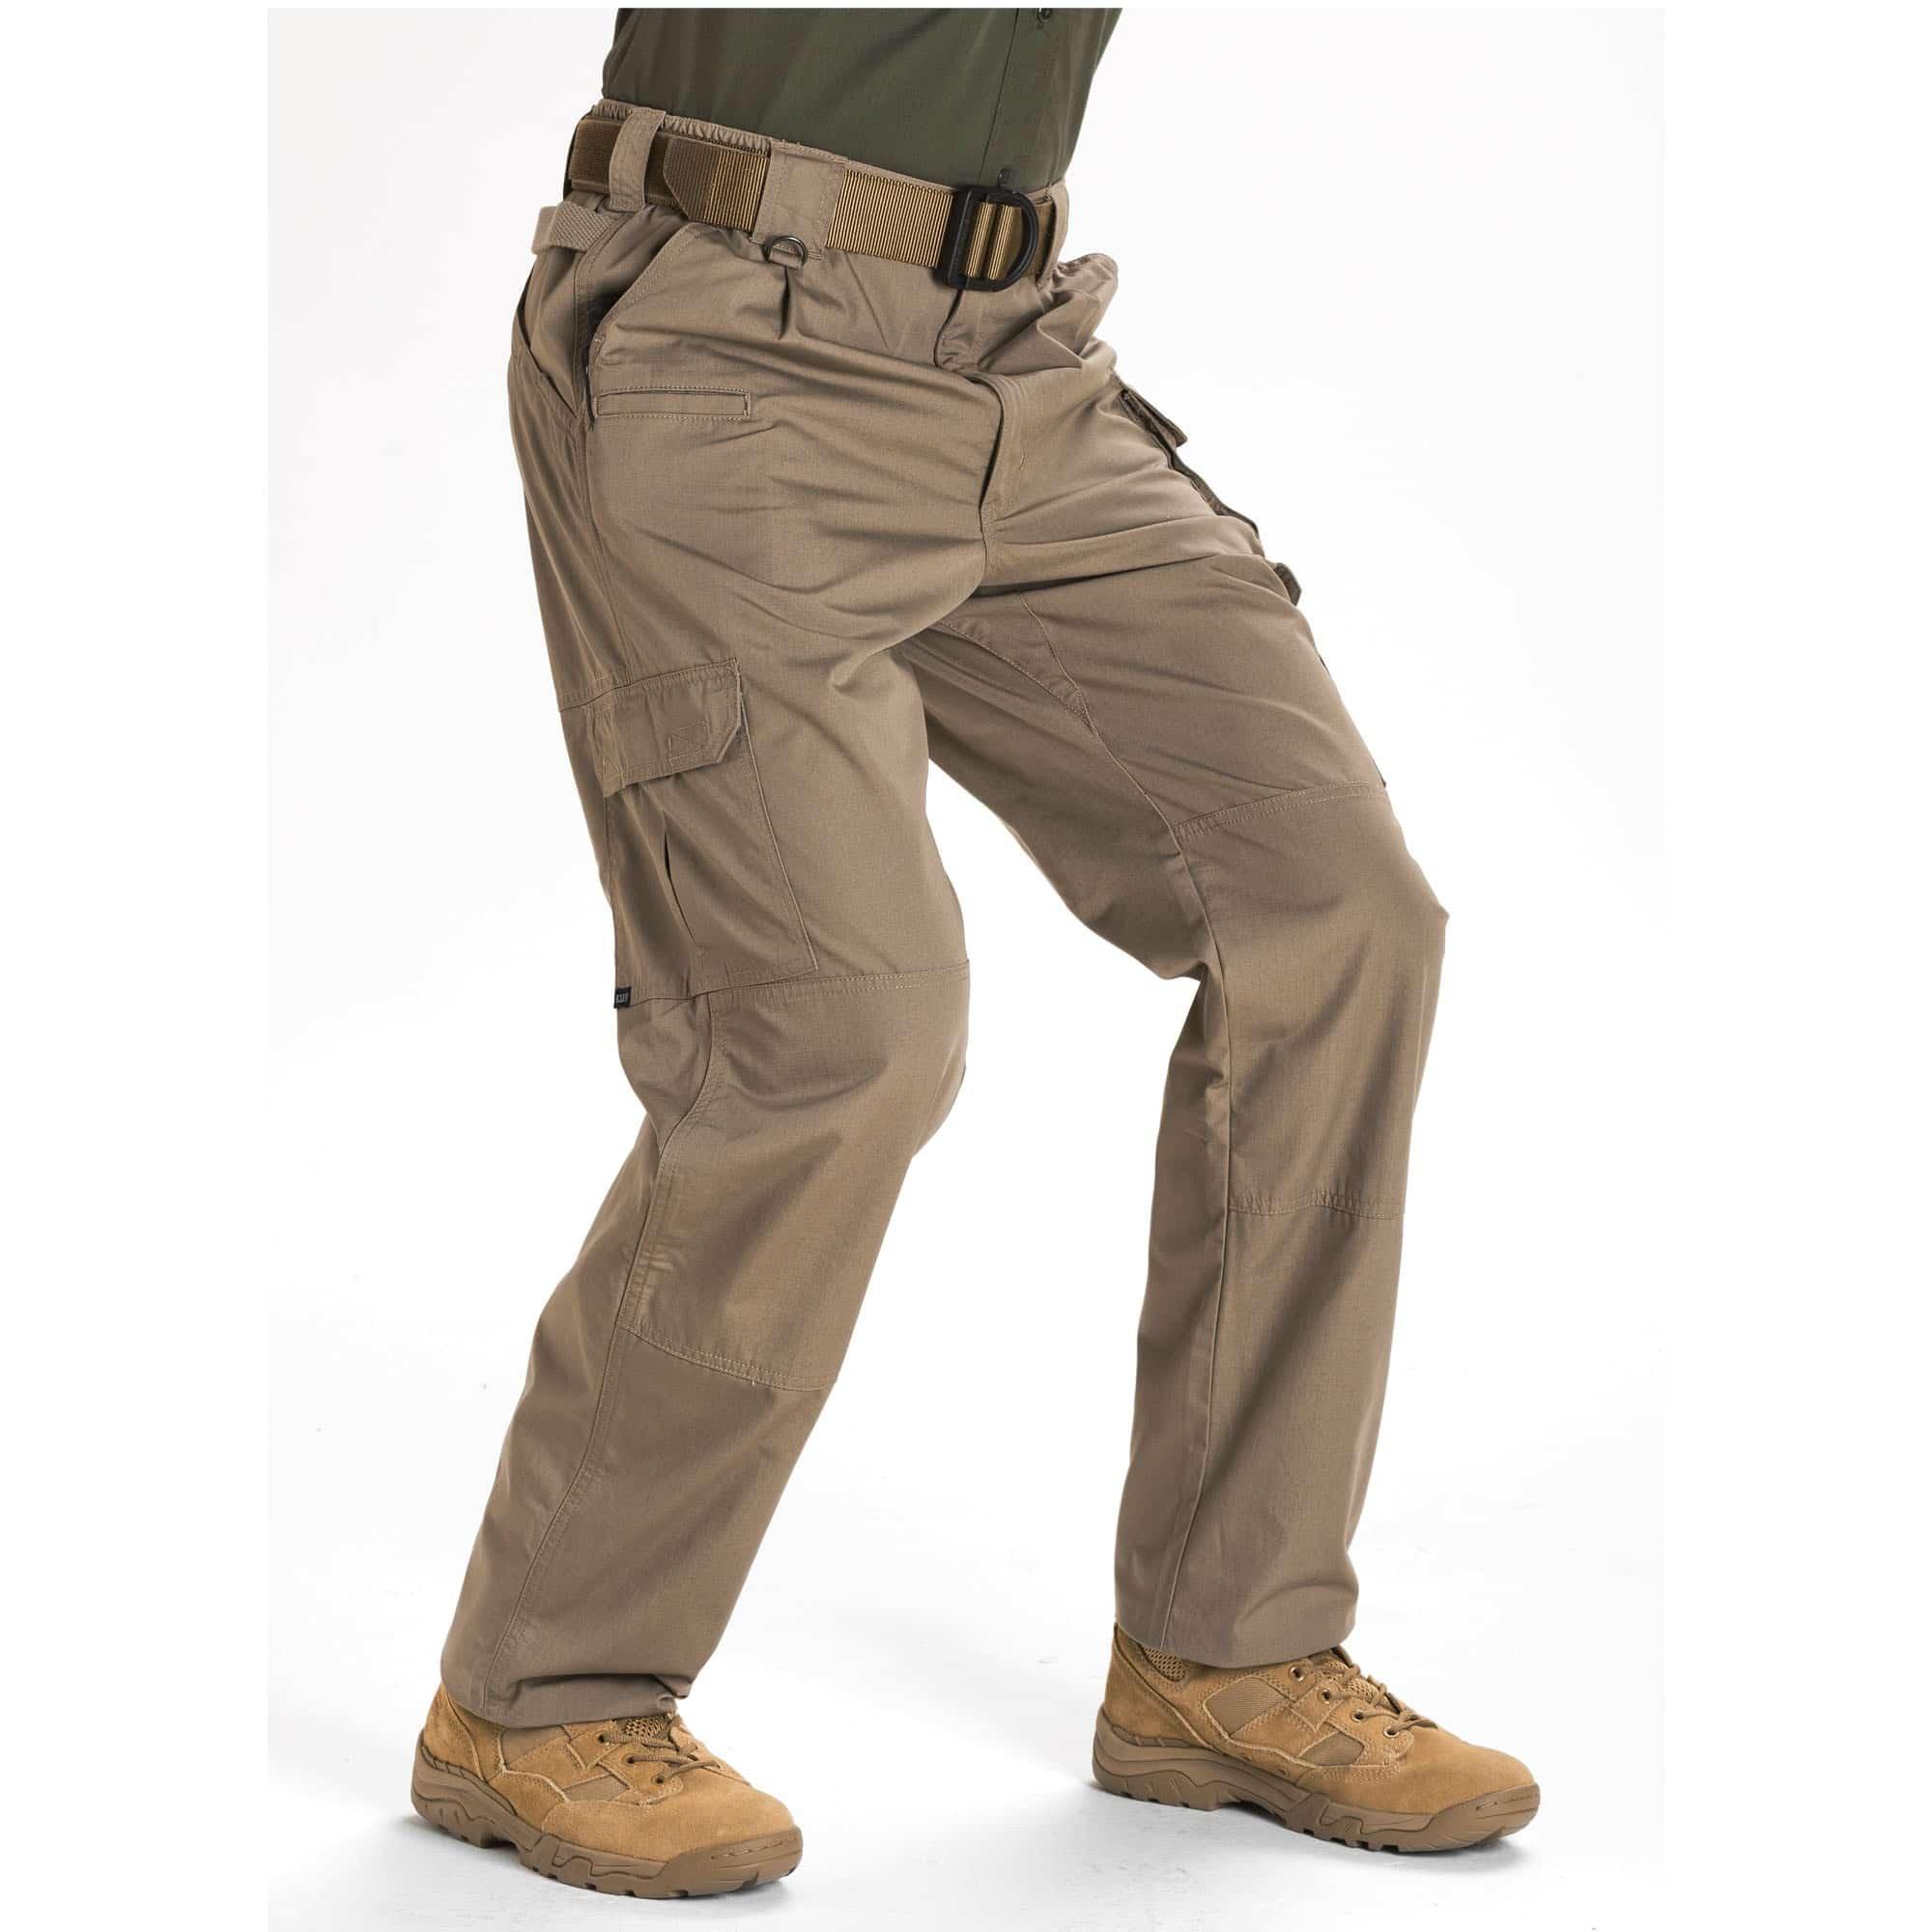 8566feca0f6c5 74273 Taclite Pro Pants Rip-Stop Cargo – Cal Uniforms